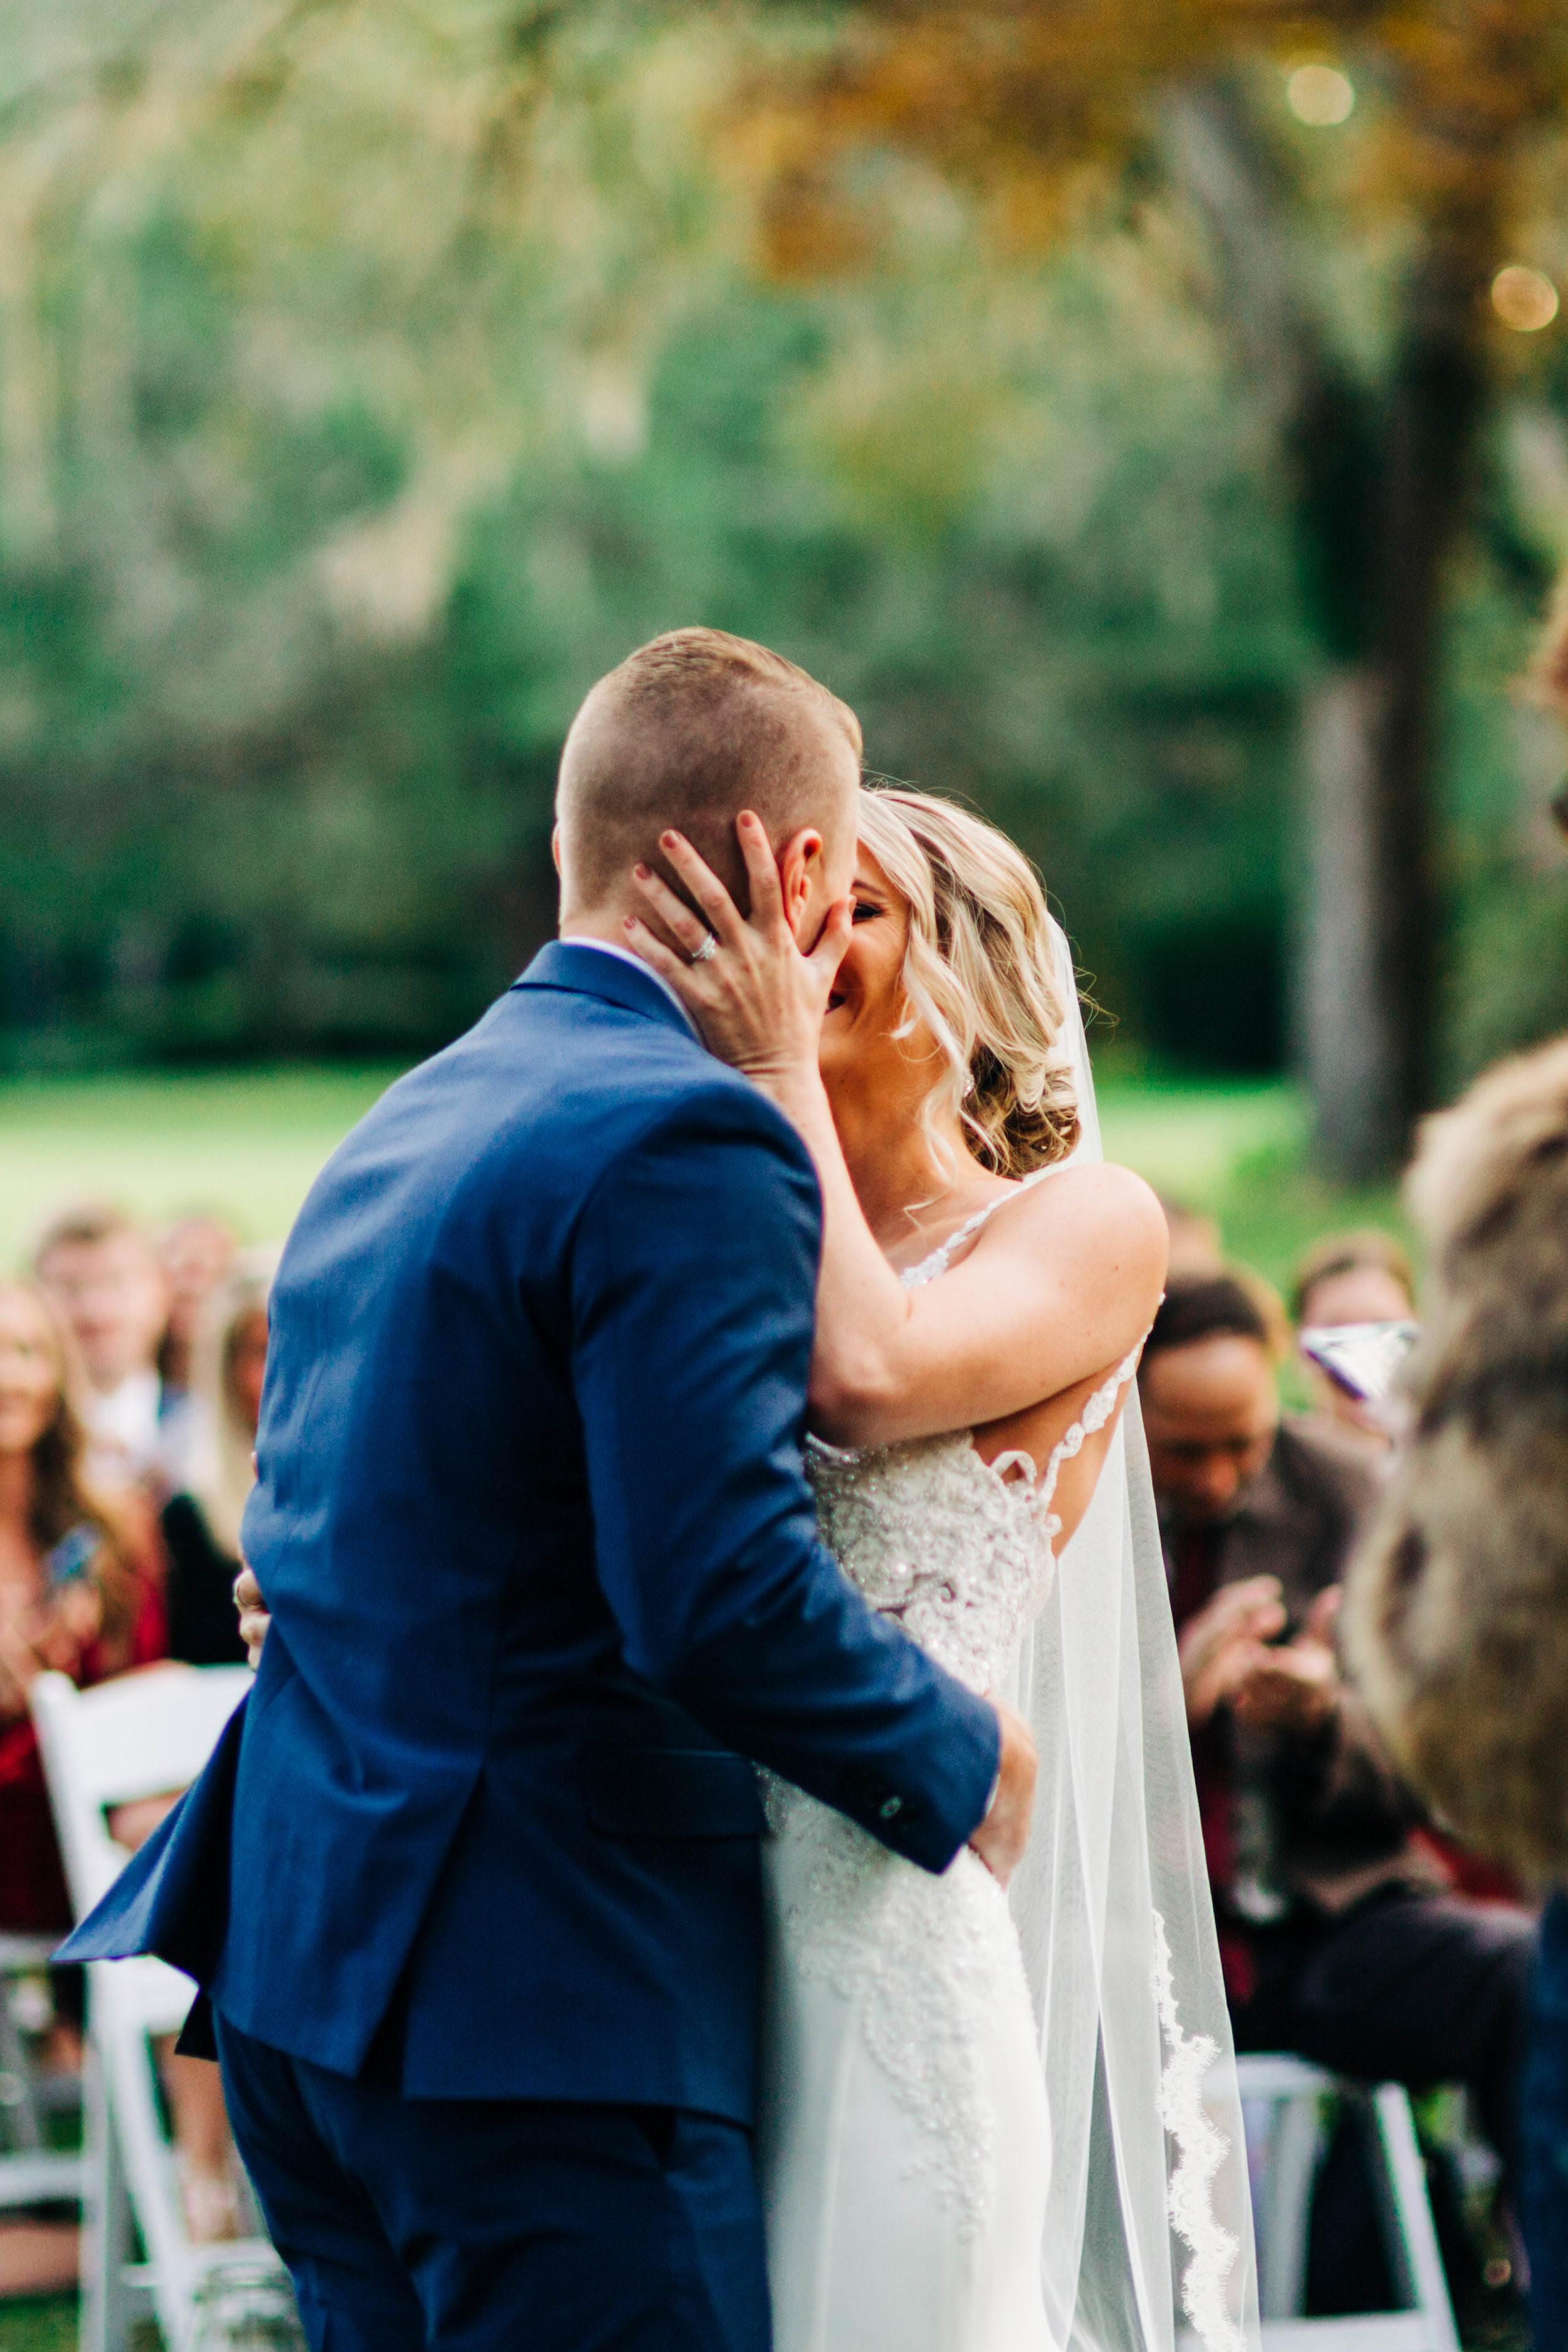 Ricky & Brittney - Ceremony - Jake & Katie Photography_153.jpg